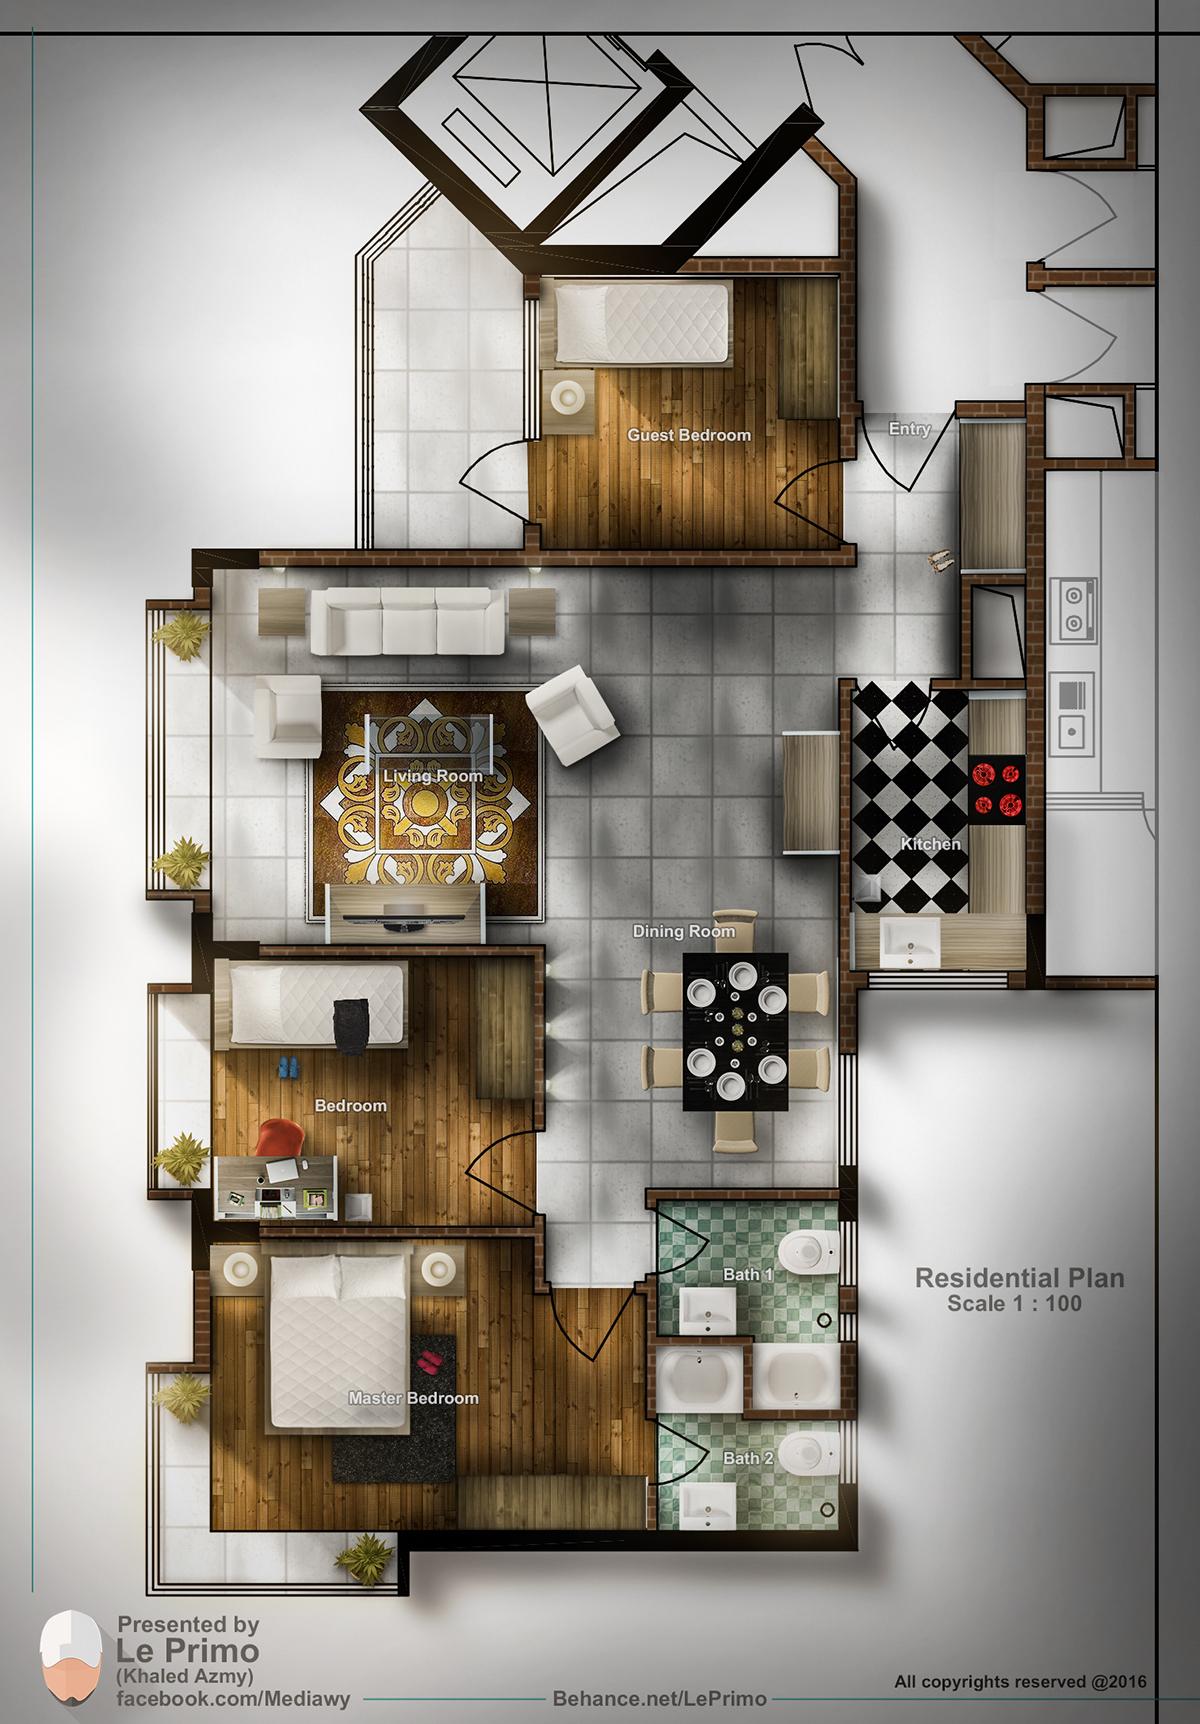 Residential plan Rendering on Behance